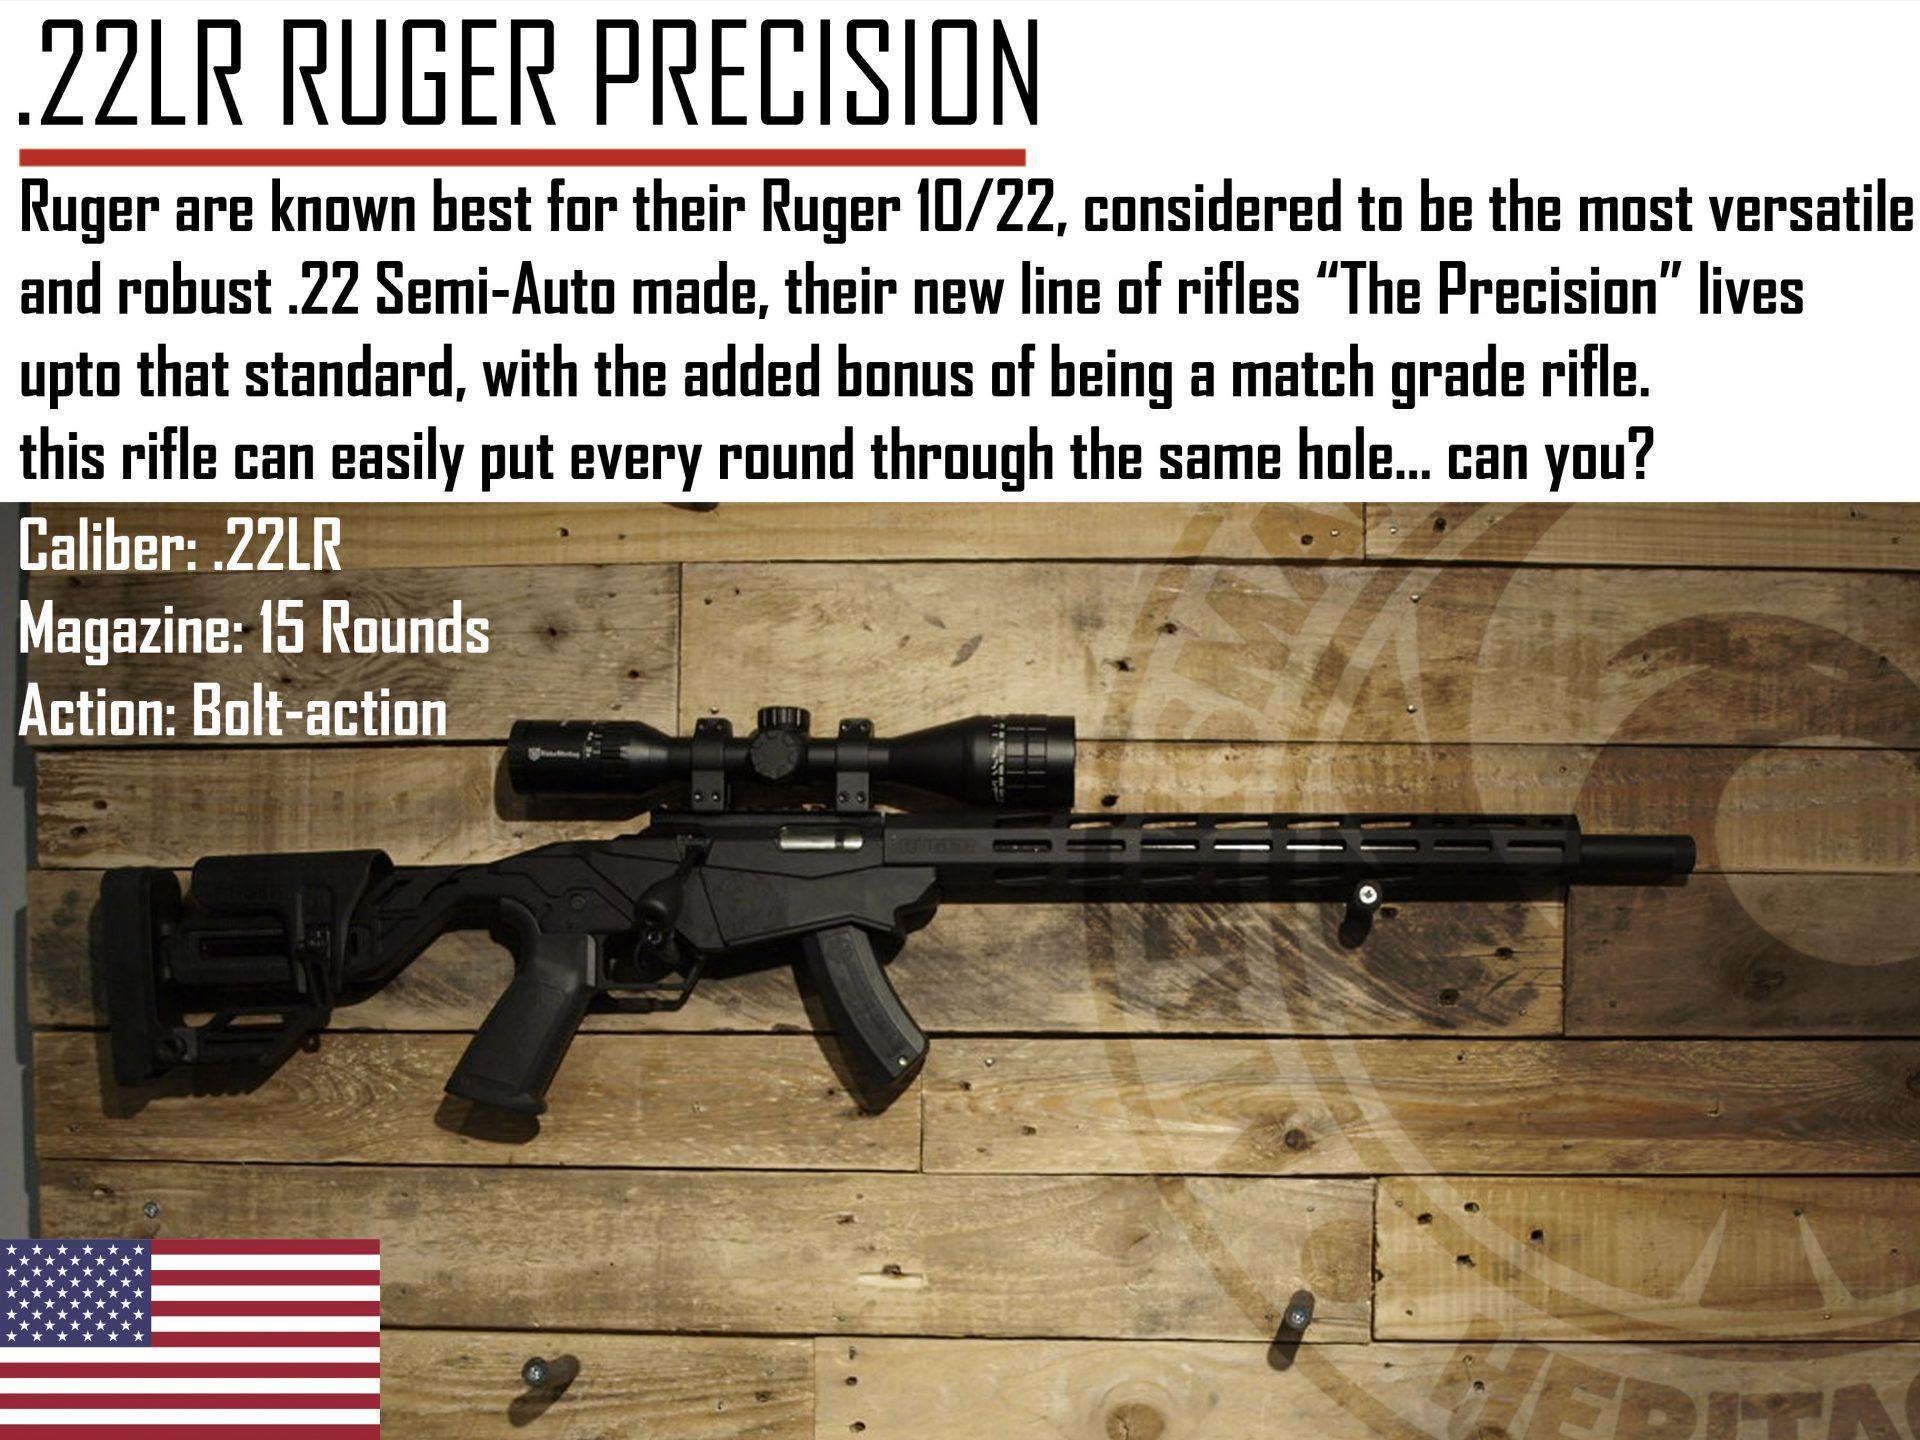 Guns For Hire - Phoenix Range